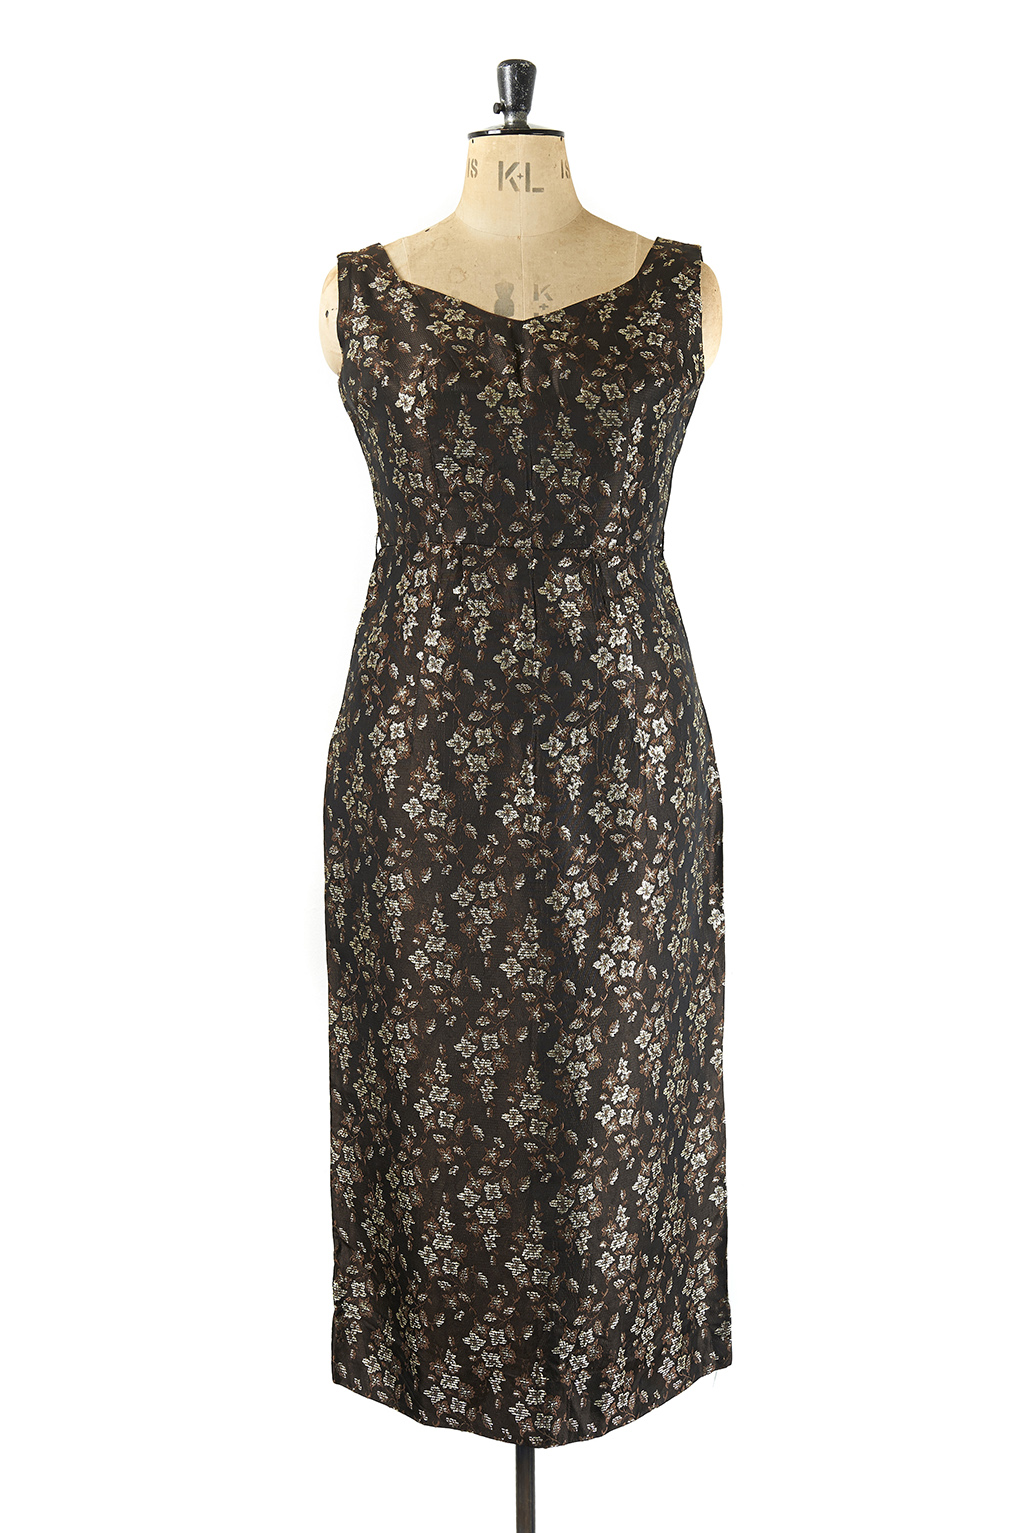 Vintage Wiggle Dress, 1950s - Size 16